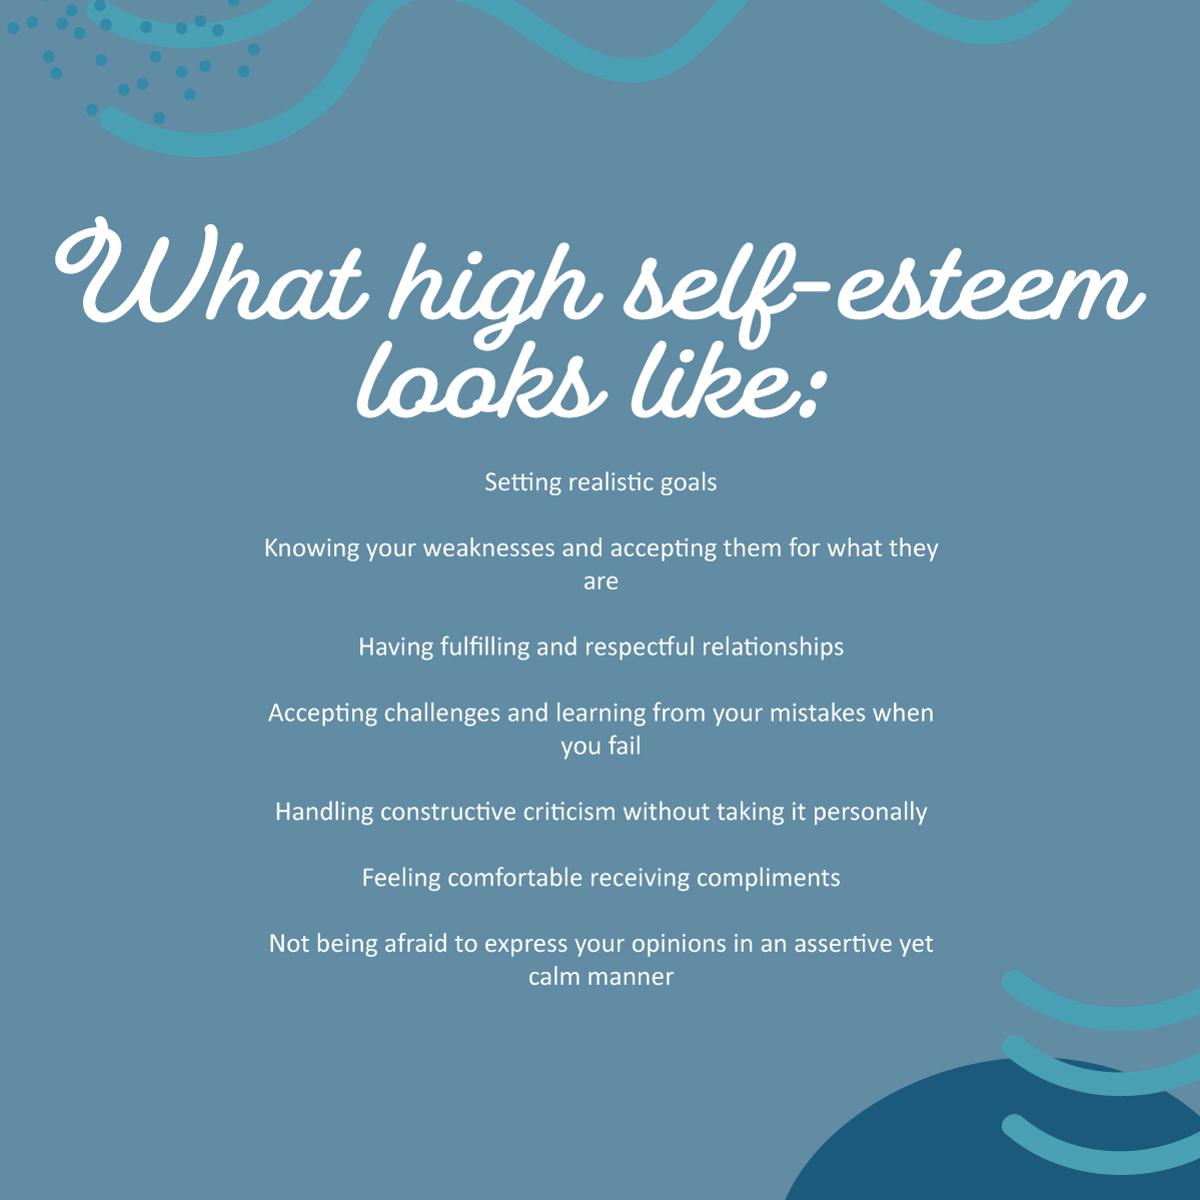 What high self esteem looks like